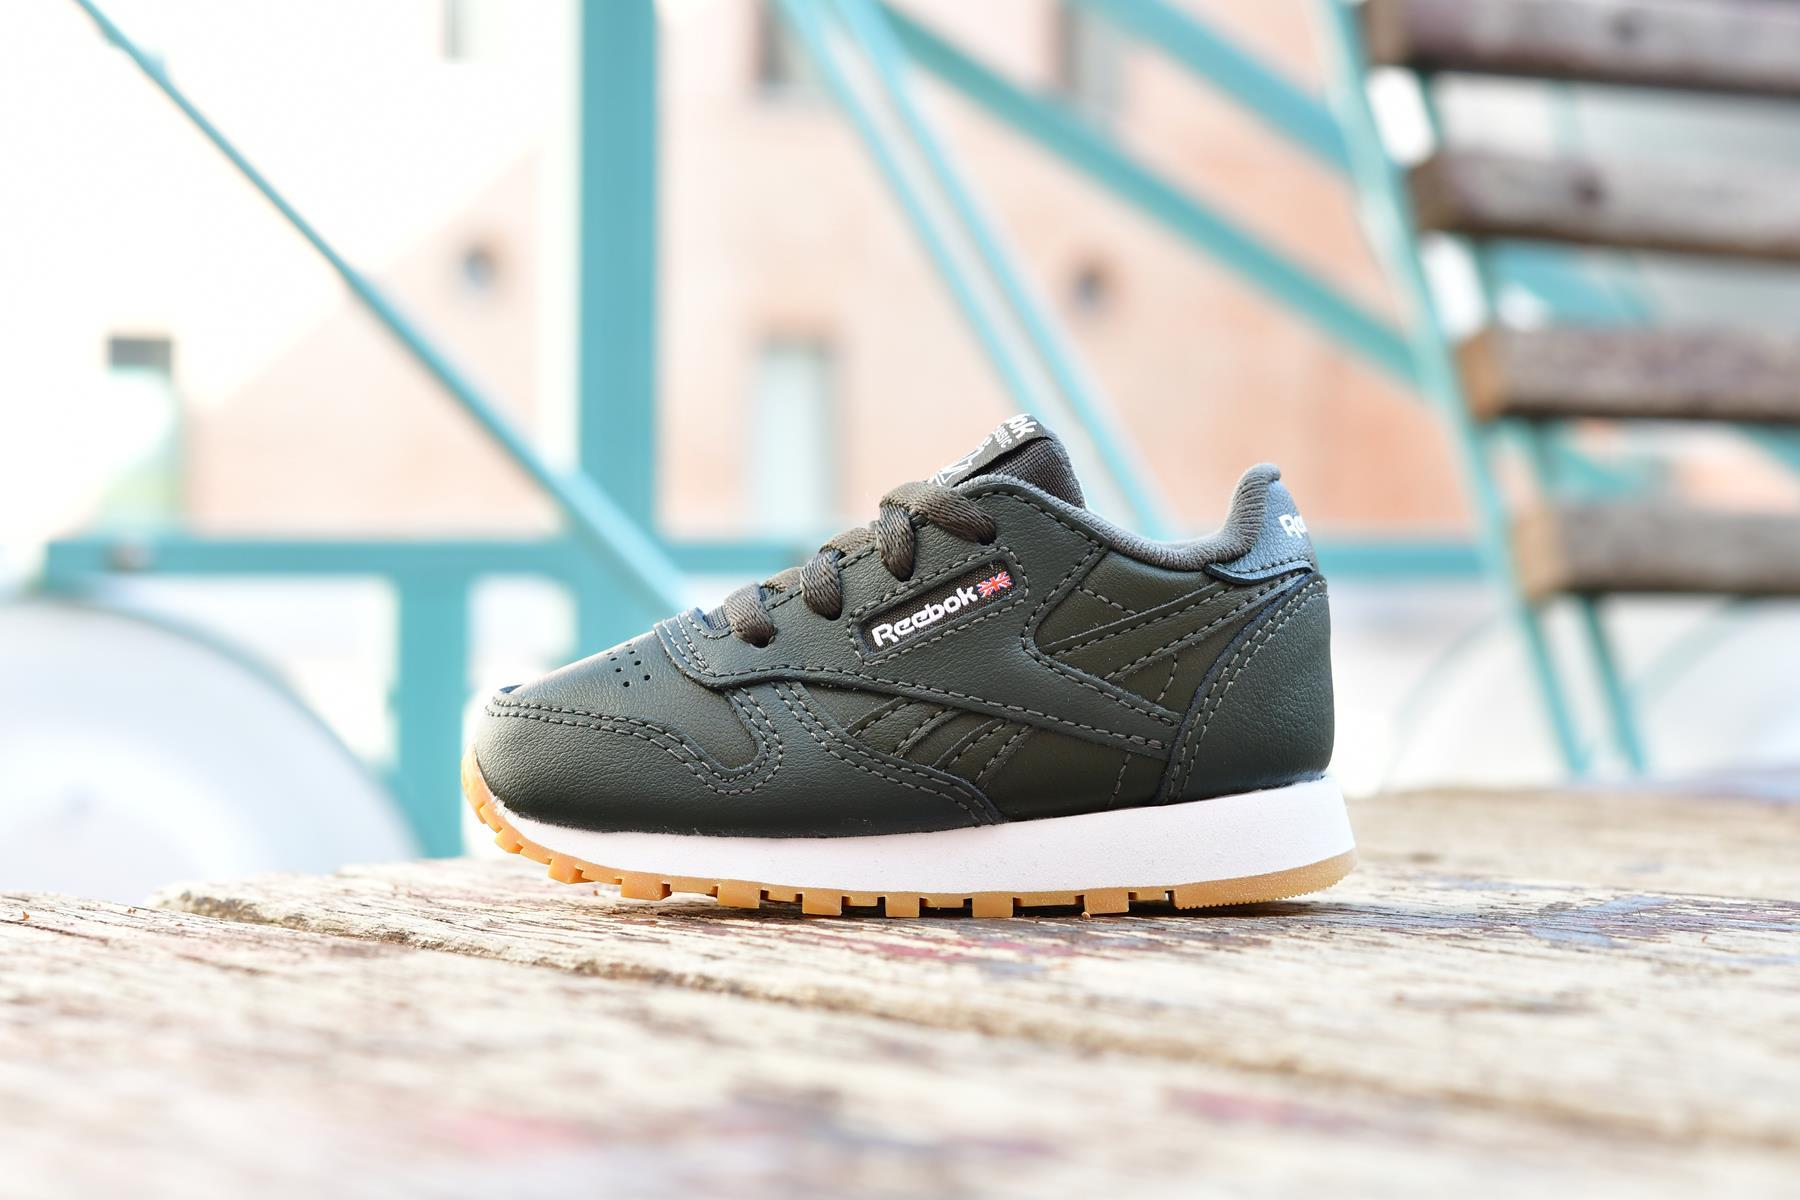 CN5615_AmorShoes-Reebok-Classic-Leather-Dark-Cypress-infants-niño-bebe-zapatilla-cordones-verde-oscuro-CN5615